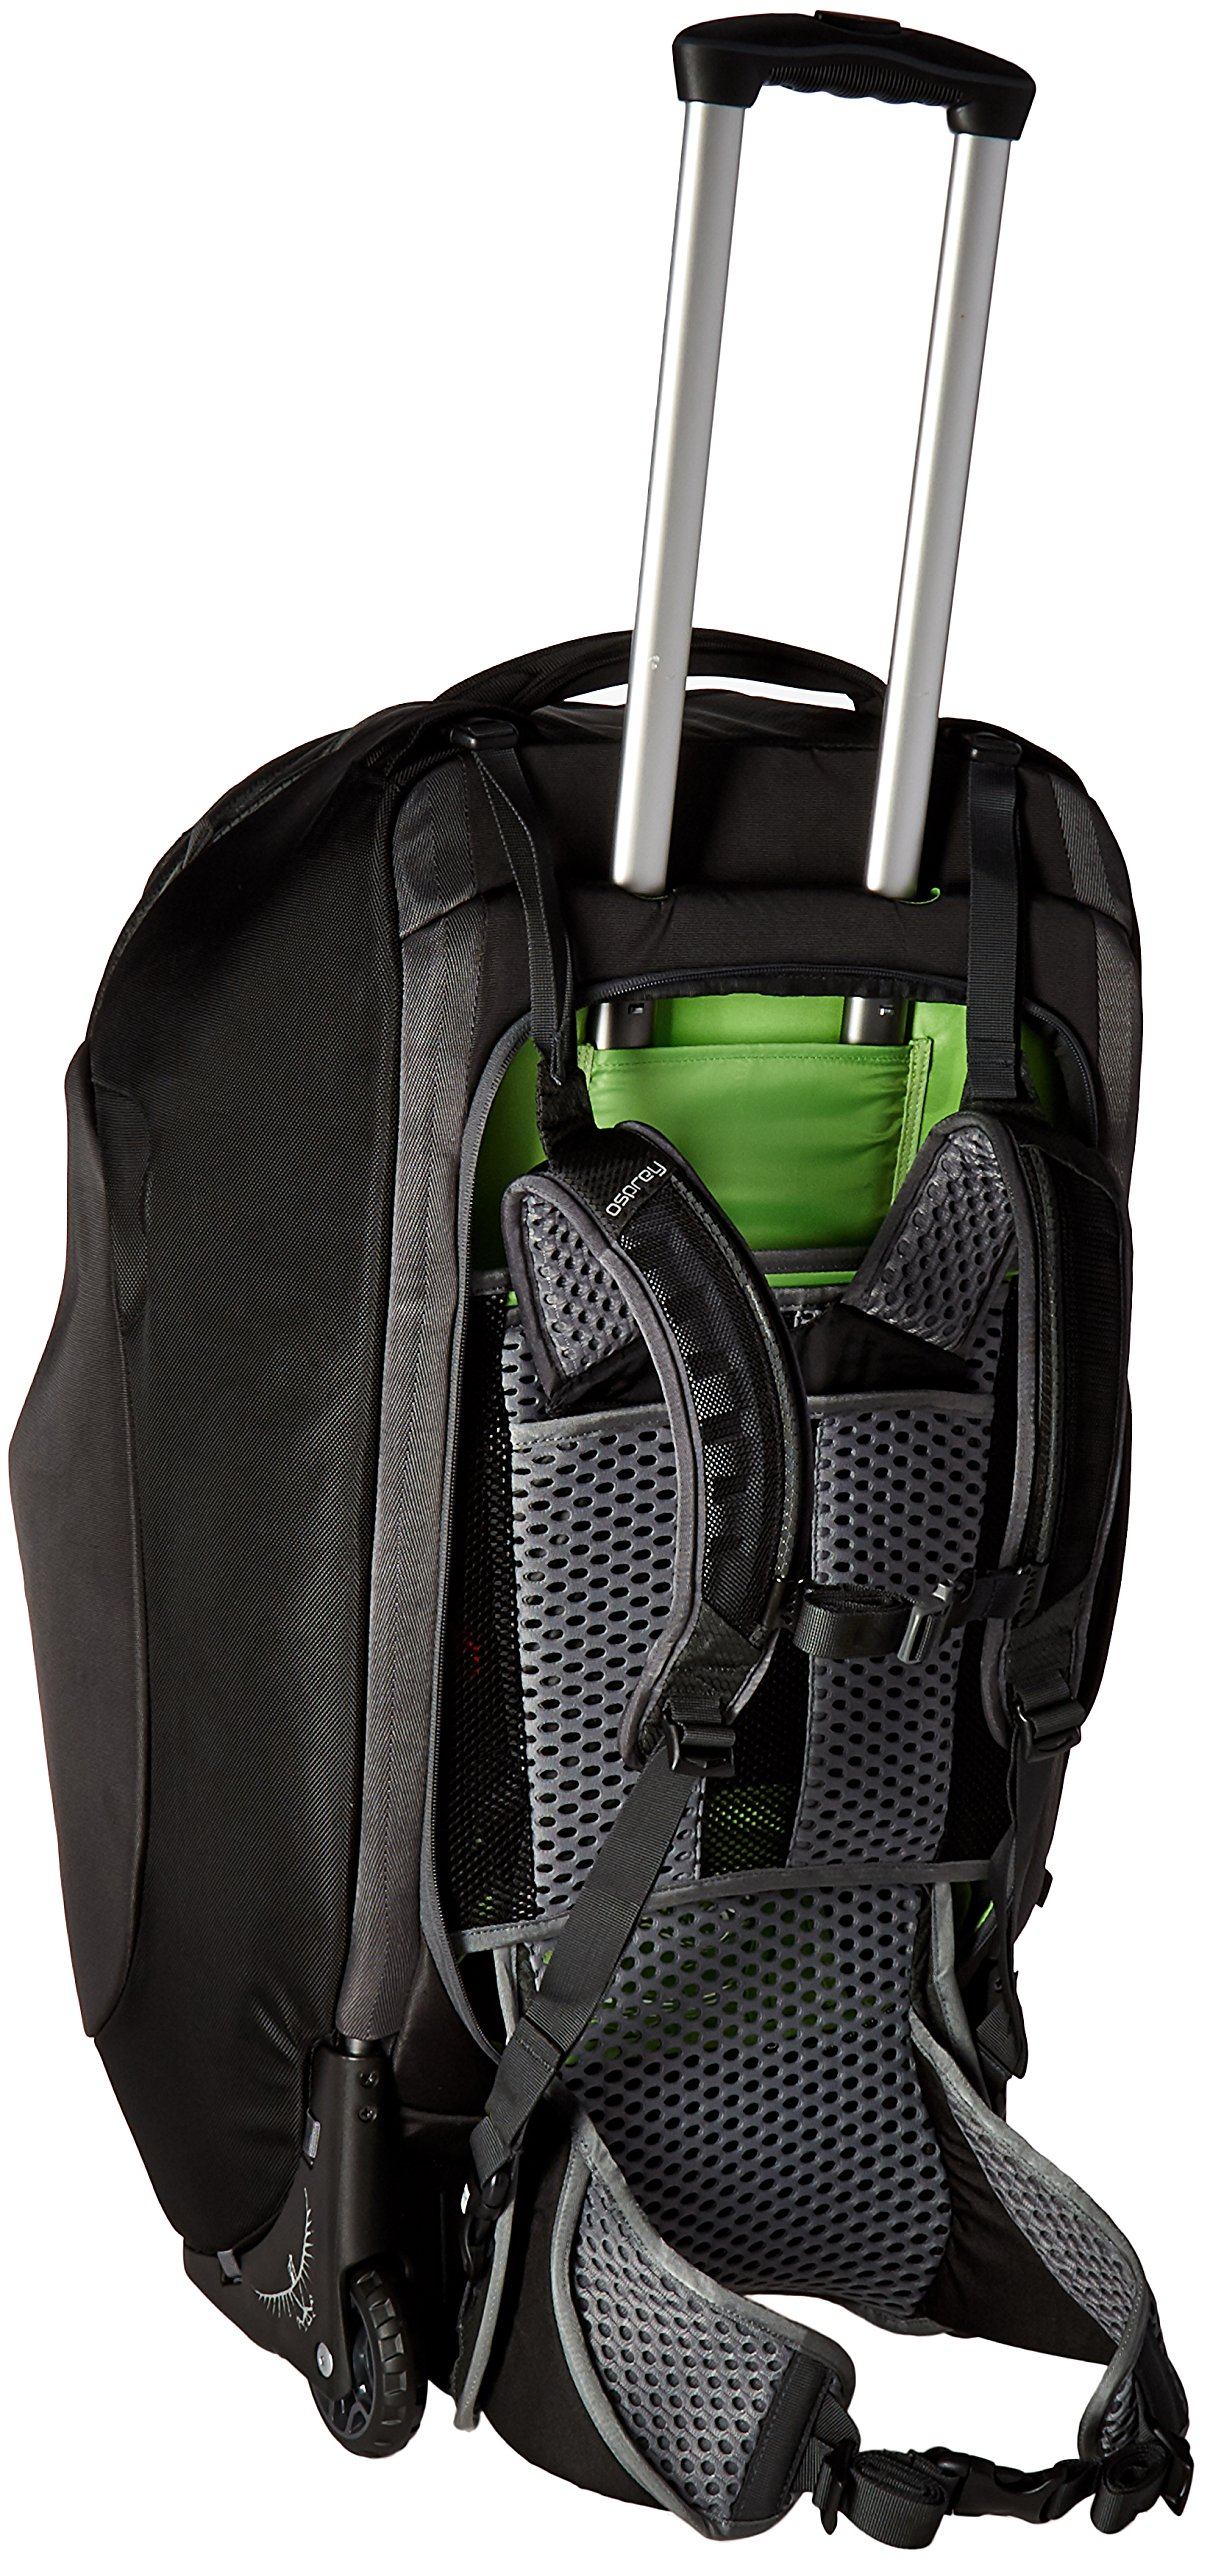 39e396231 Buyr.com - Osprey Packs Sojourn Wheeled Luggage, Flash Black, 80 L/28